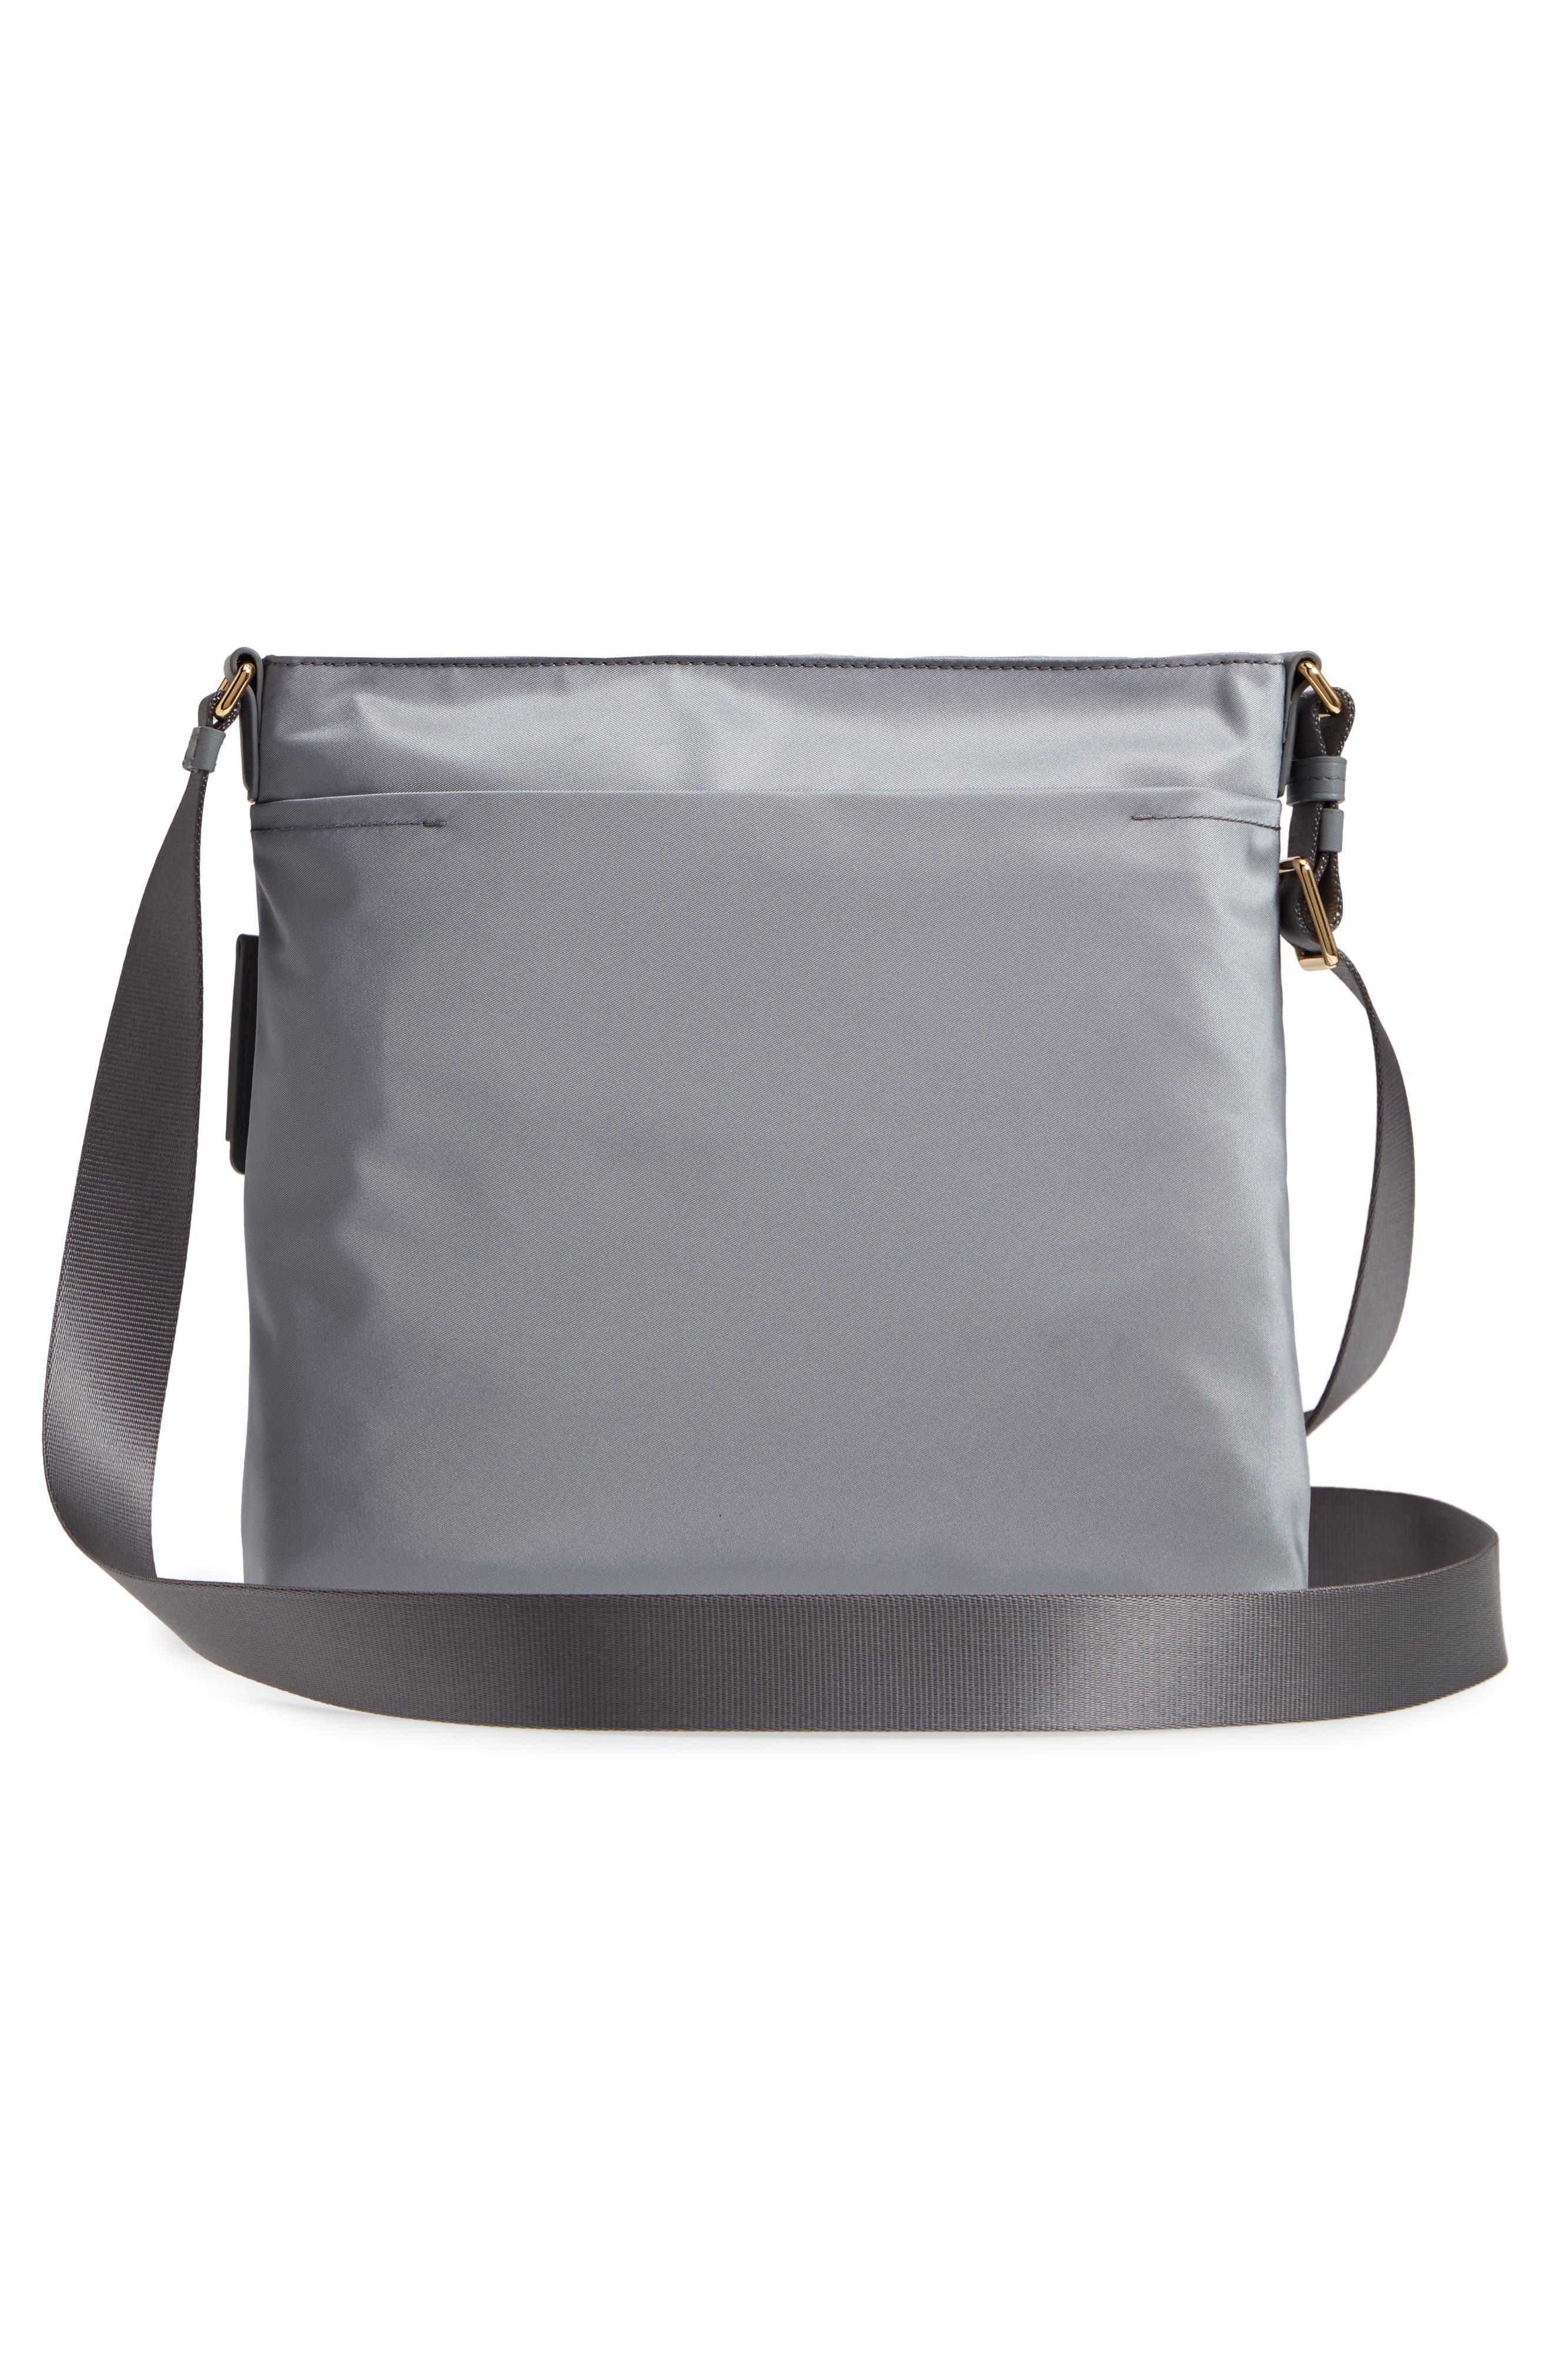 Voyager - Capri Nylon Crossbody Bag,                             Alternate thumbnail 3, color,                             Grey